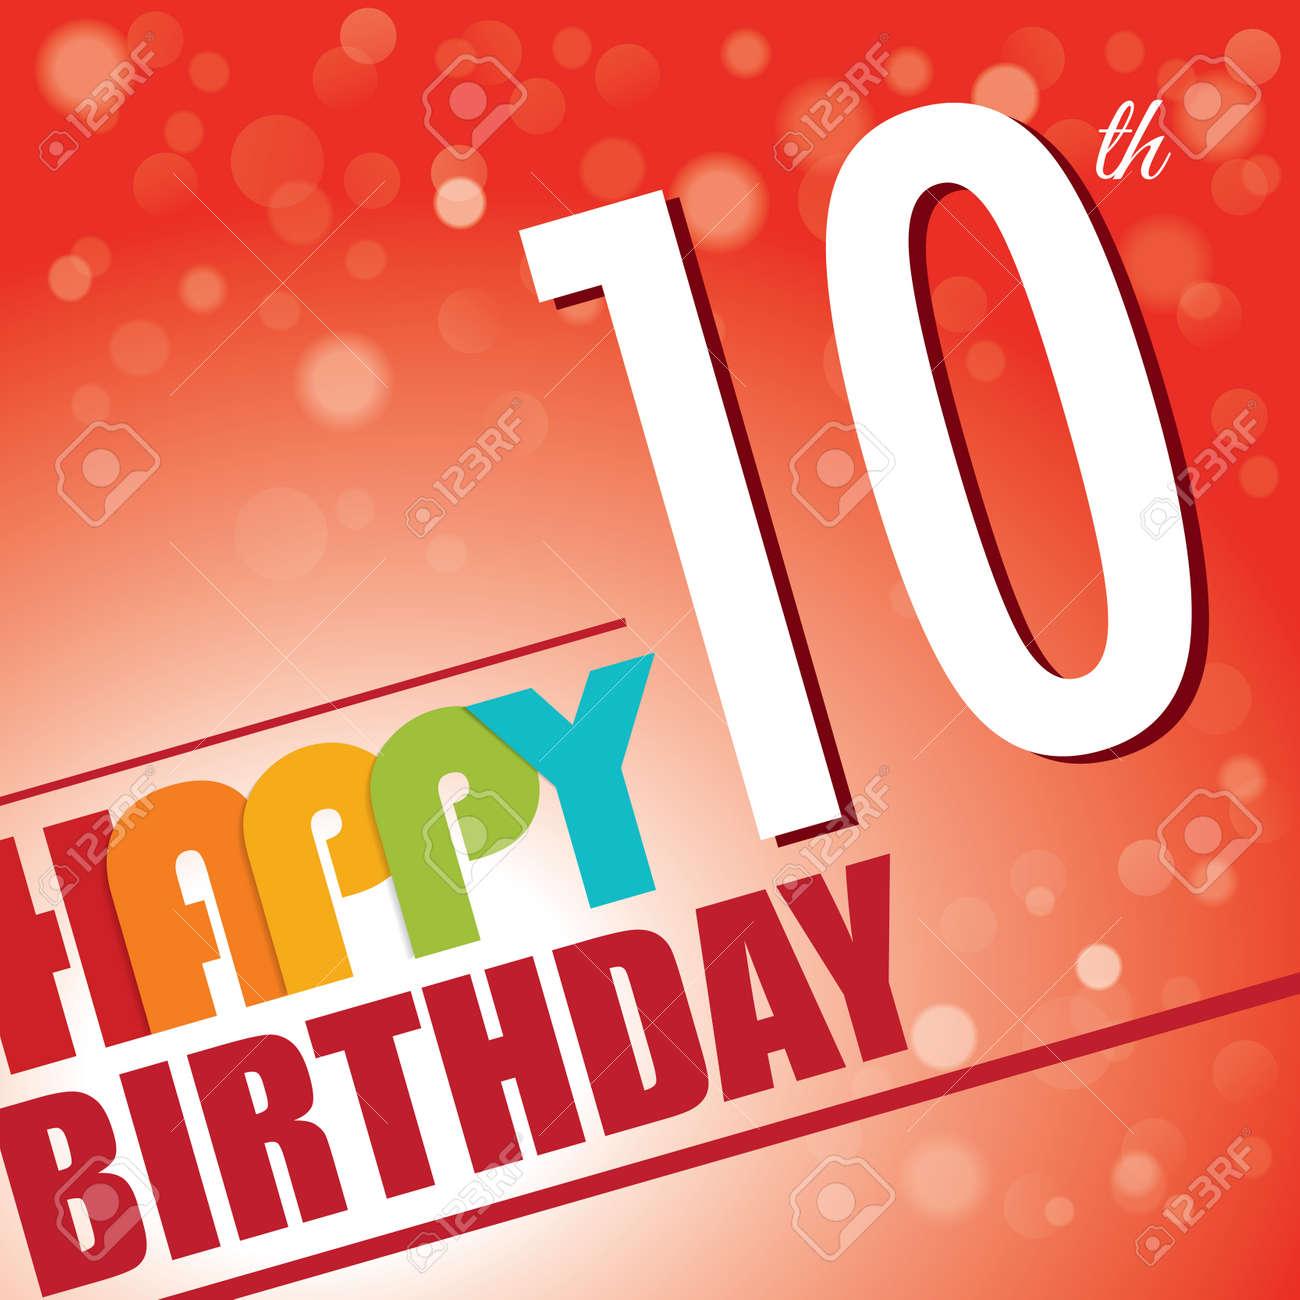 10th birthday party invite template design in bright and colourful